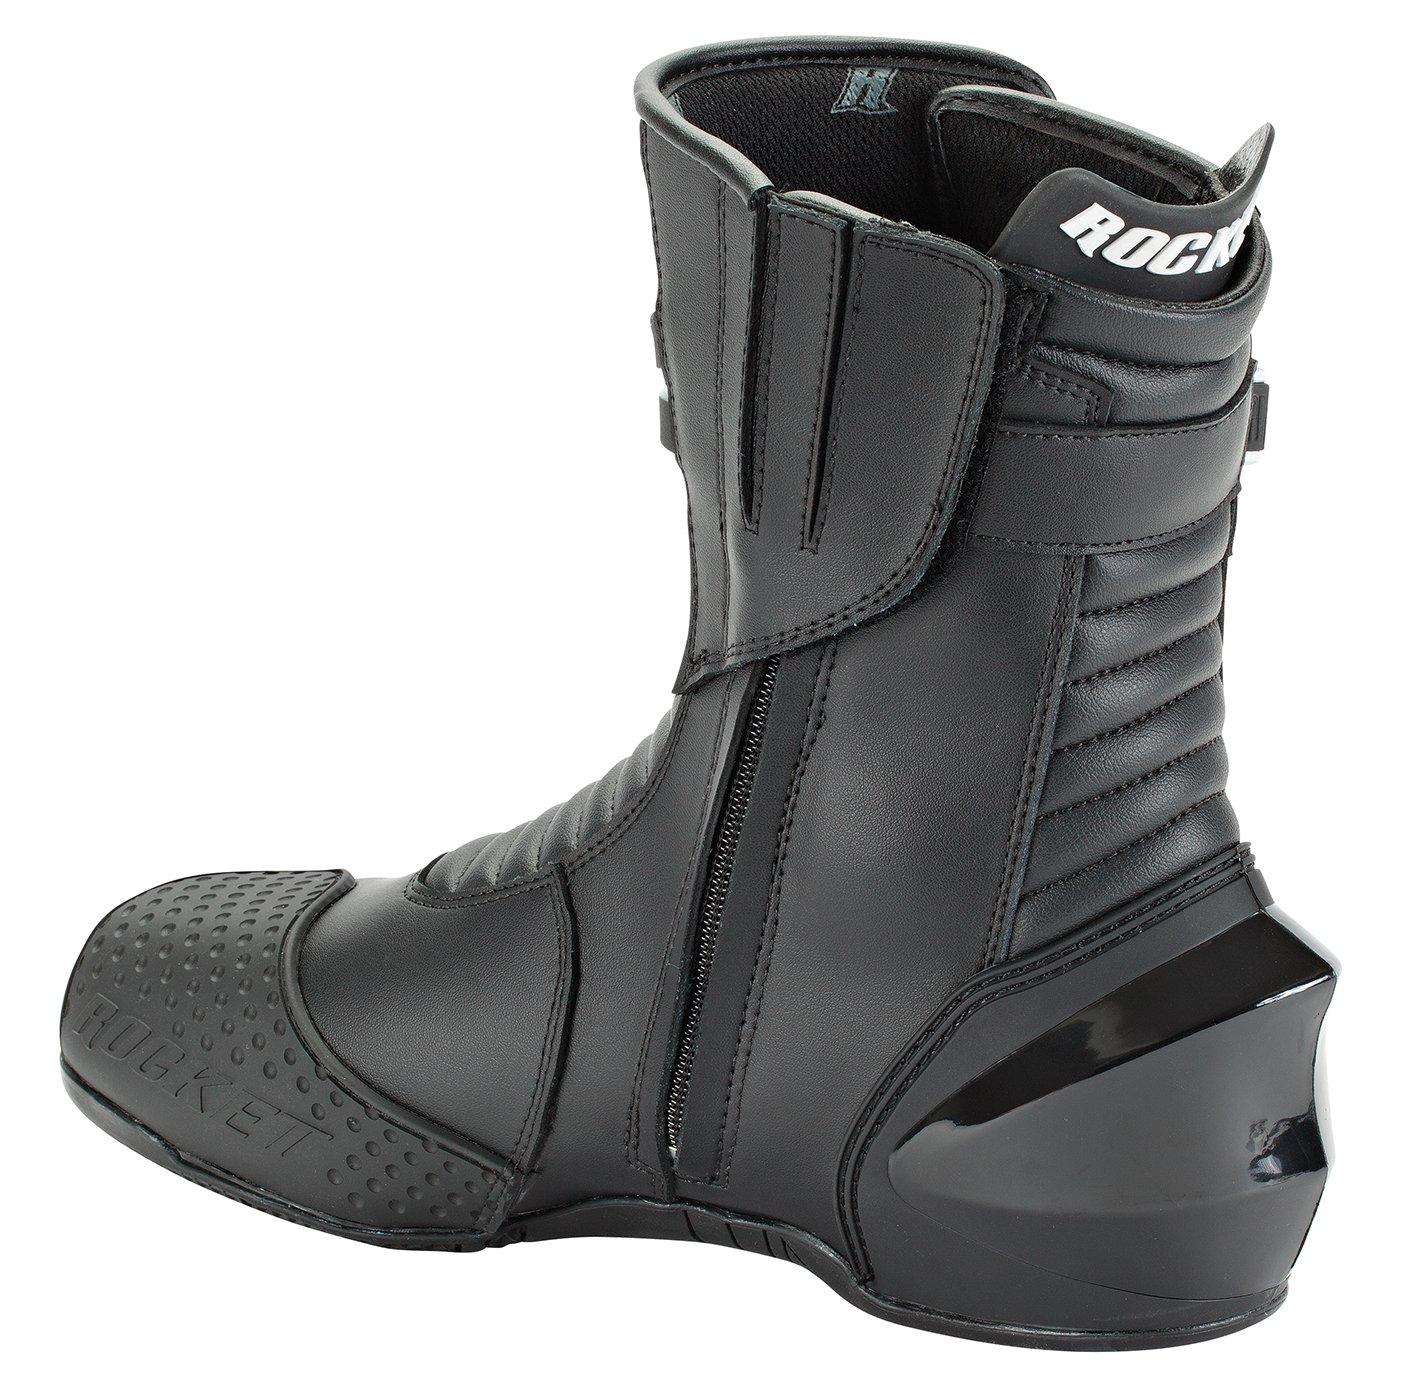 Joe Rocket Super Street RX14 Men's Leather Motorcycle Riding Boots (Black, Size 9.5) by Joe Rocket (Image #2)